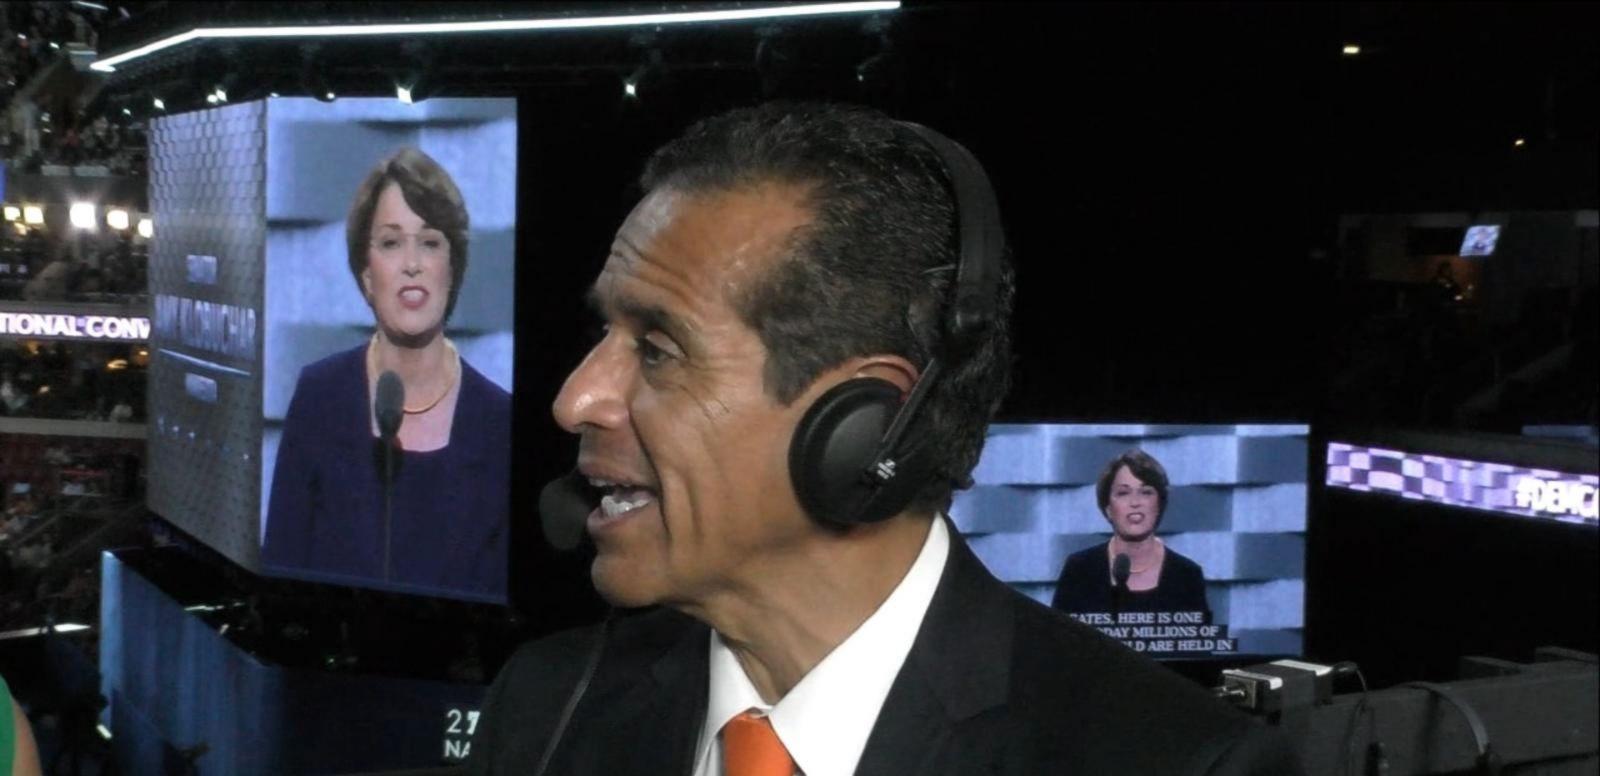 VIDEO: Former Mayor Antonio Villaraigosa Discusses Homelessness and Immigration